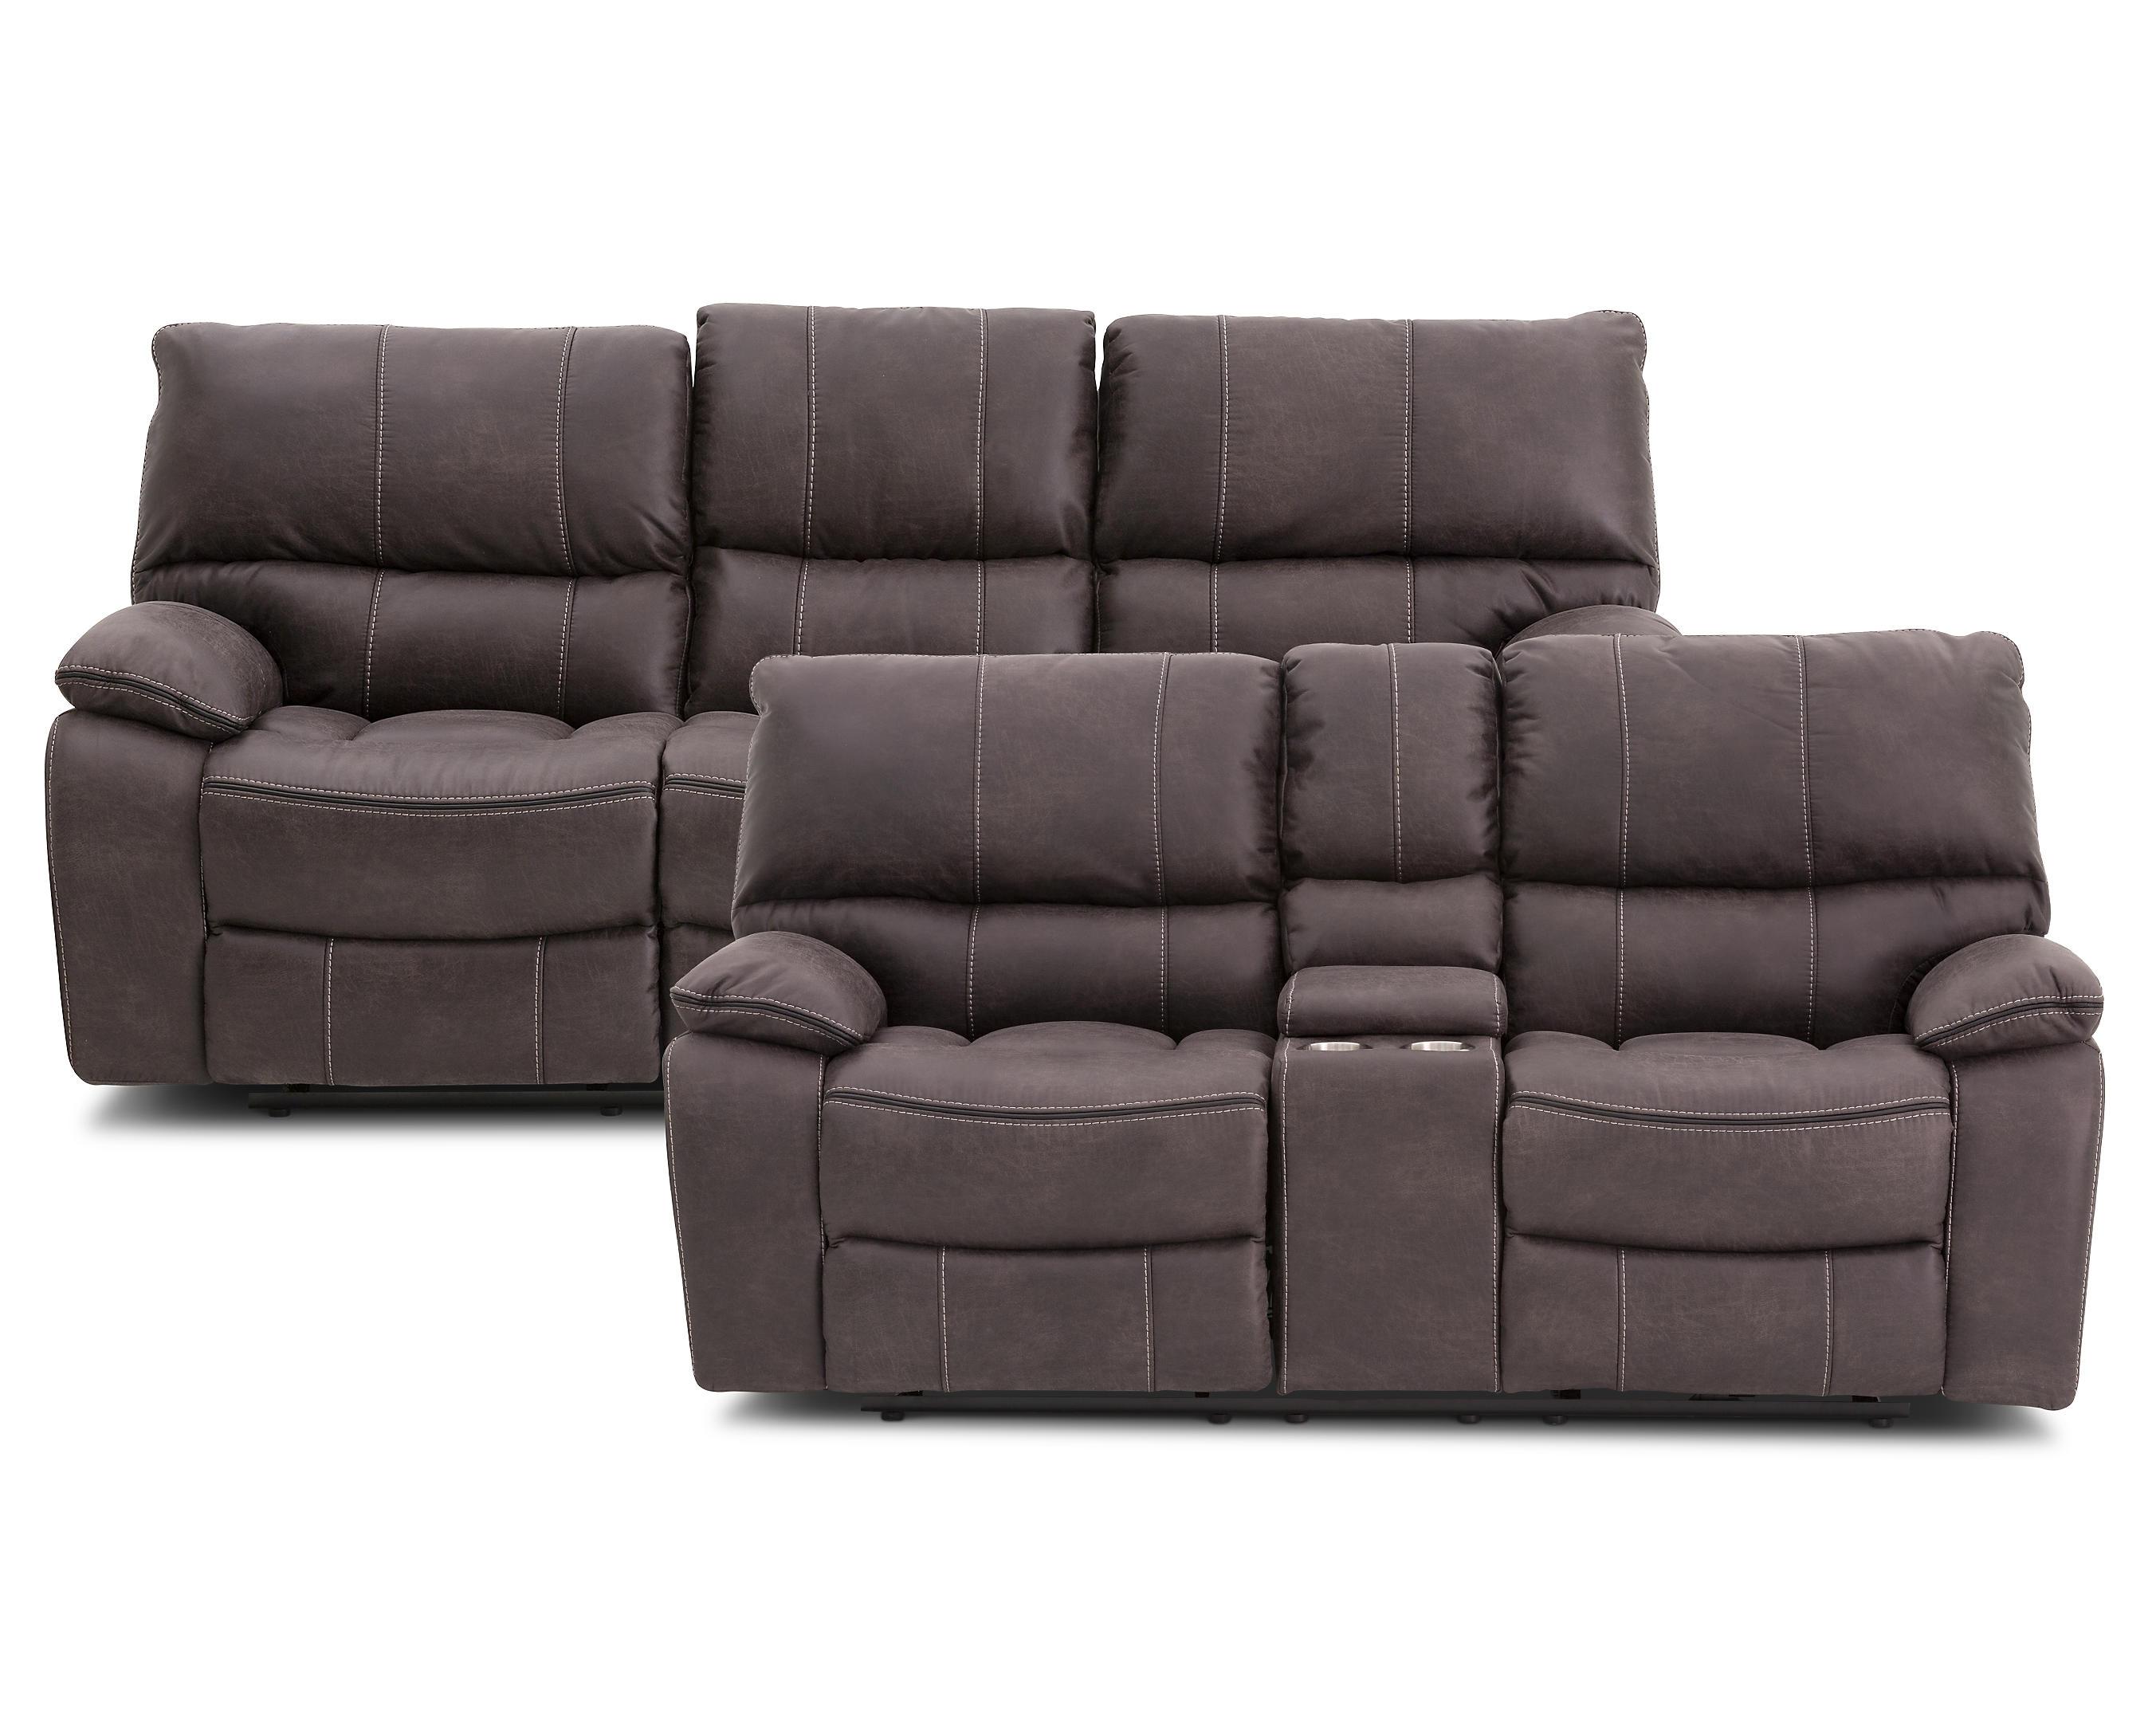 Navigator 2 Pc Power Reclining Sofa Set Furniture Row